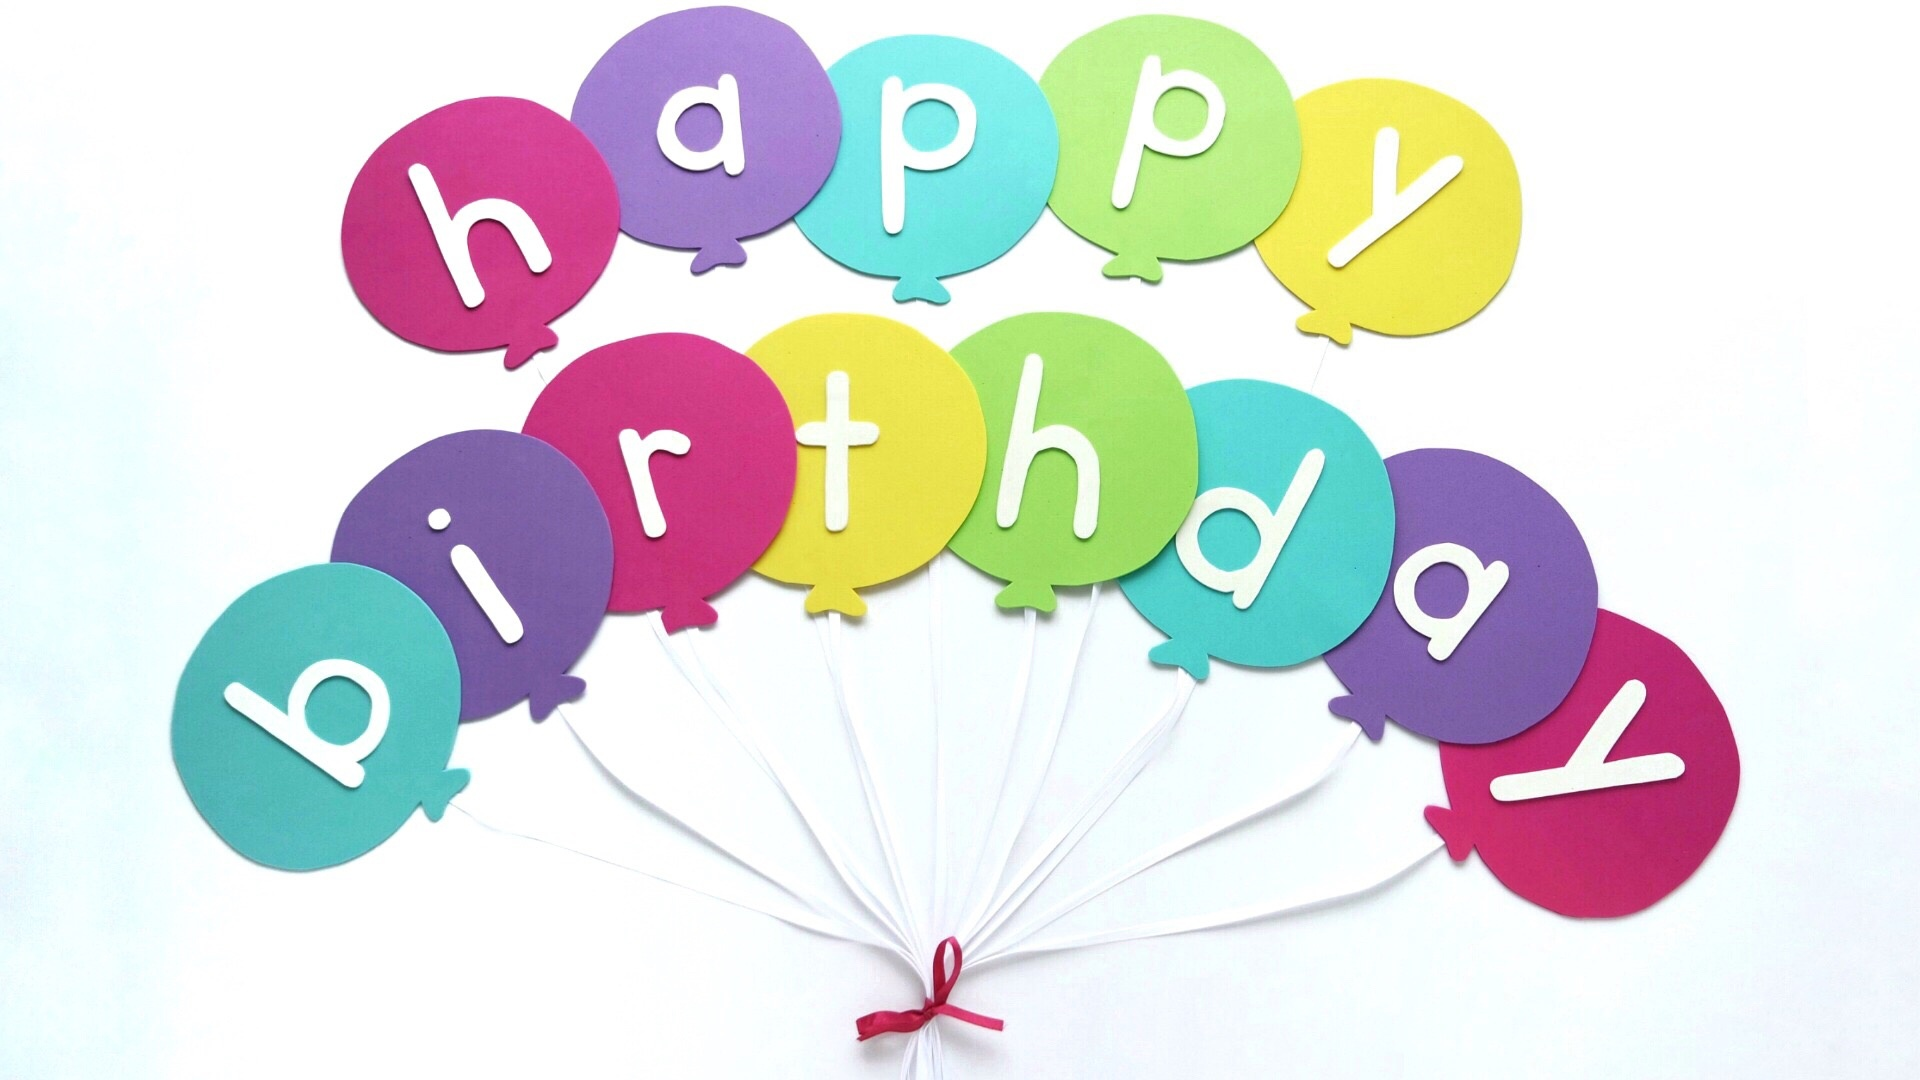 Happy Birthday Banner Diy Template | Balloon Birthday Banner Template - Diy Birthday Banner Free Printable